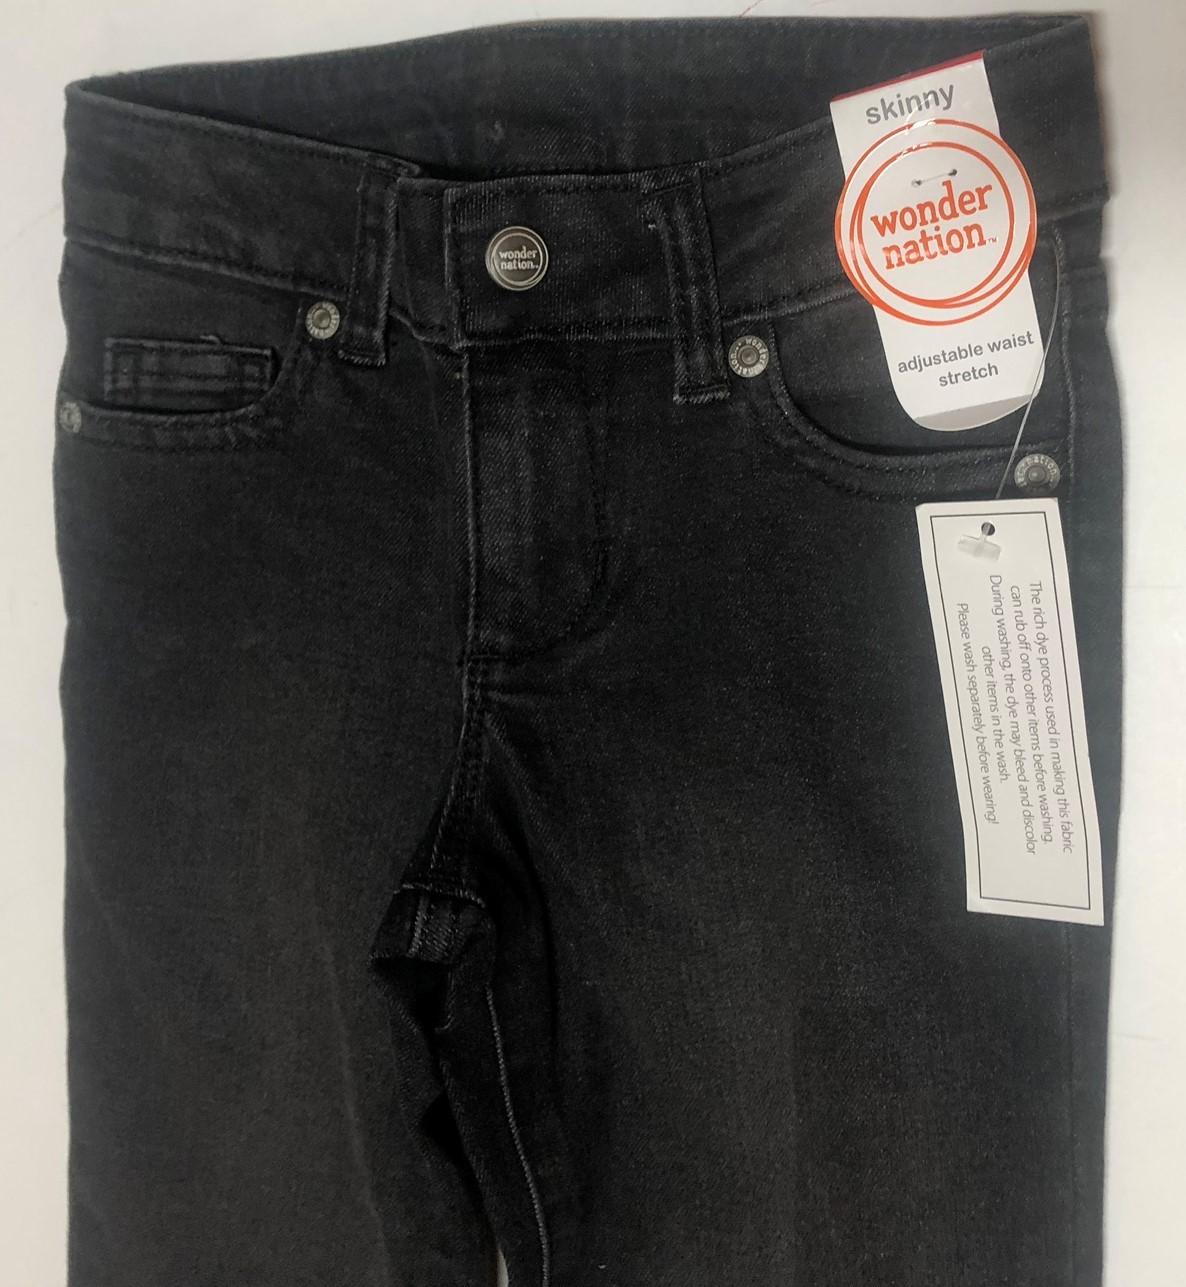 Wonder Nation Boy's Jeans Skinny Adj Waist Black Kid's Sz 6 image 3